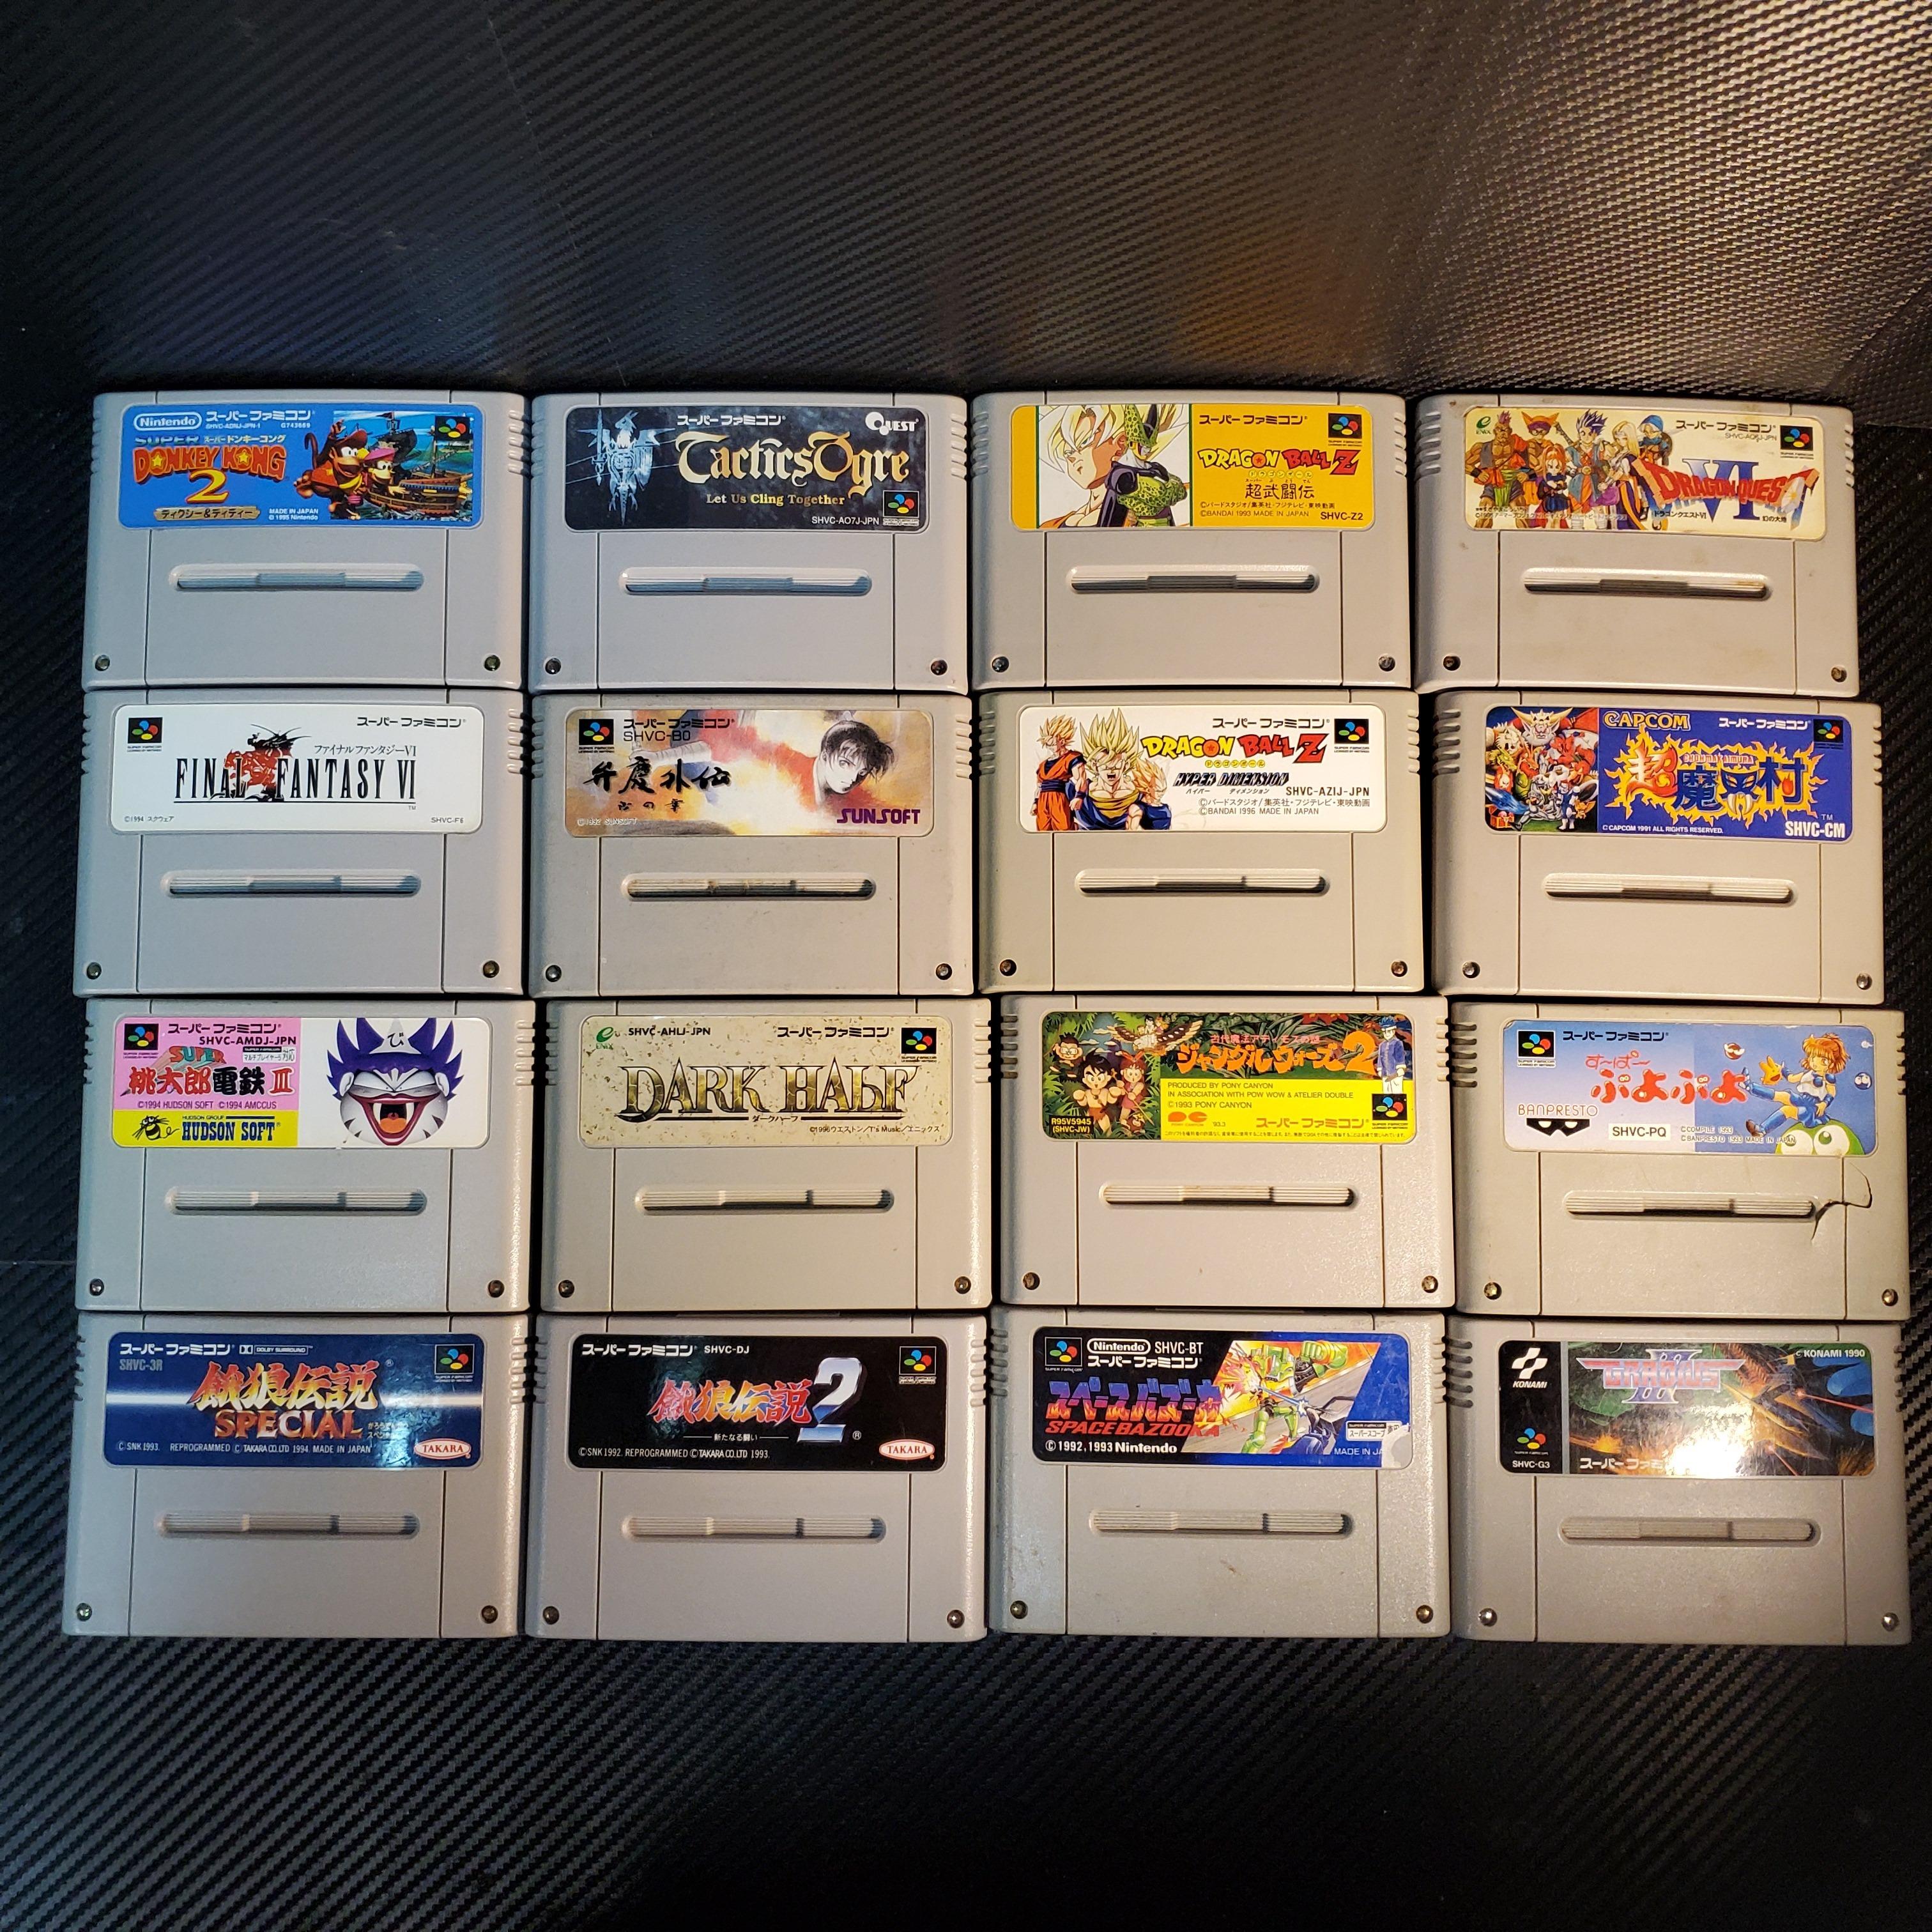 [VDS] Nostalgeek Store — Super Famicom / GBA / GB / Nintendo 64 / GameCube 201005105027505156